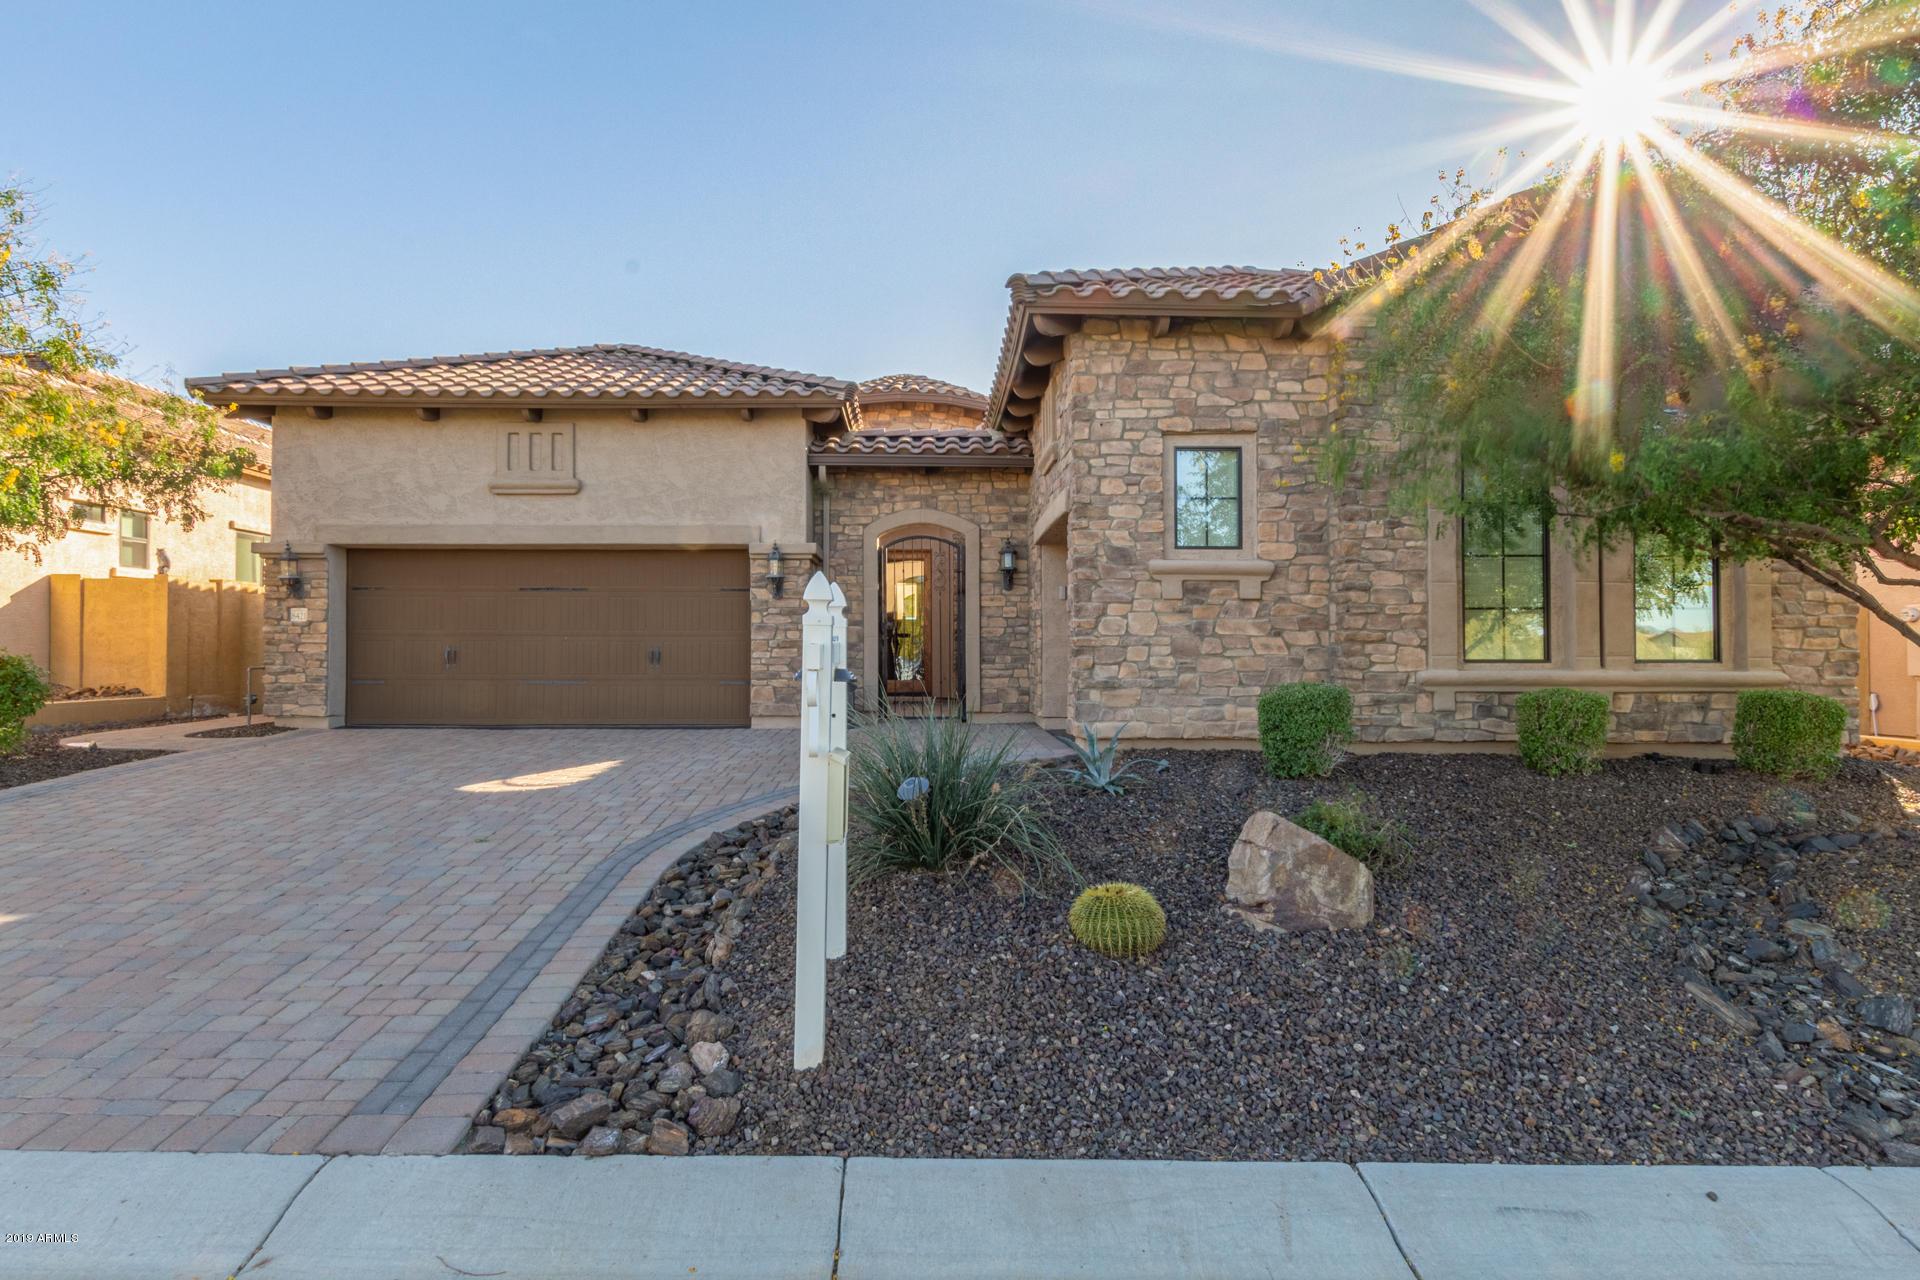 Photo of 8421 E LEONORA Street, Mesa, AZ 85207